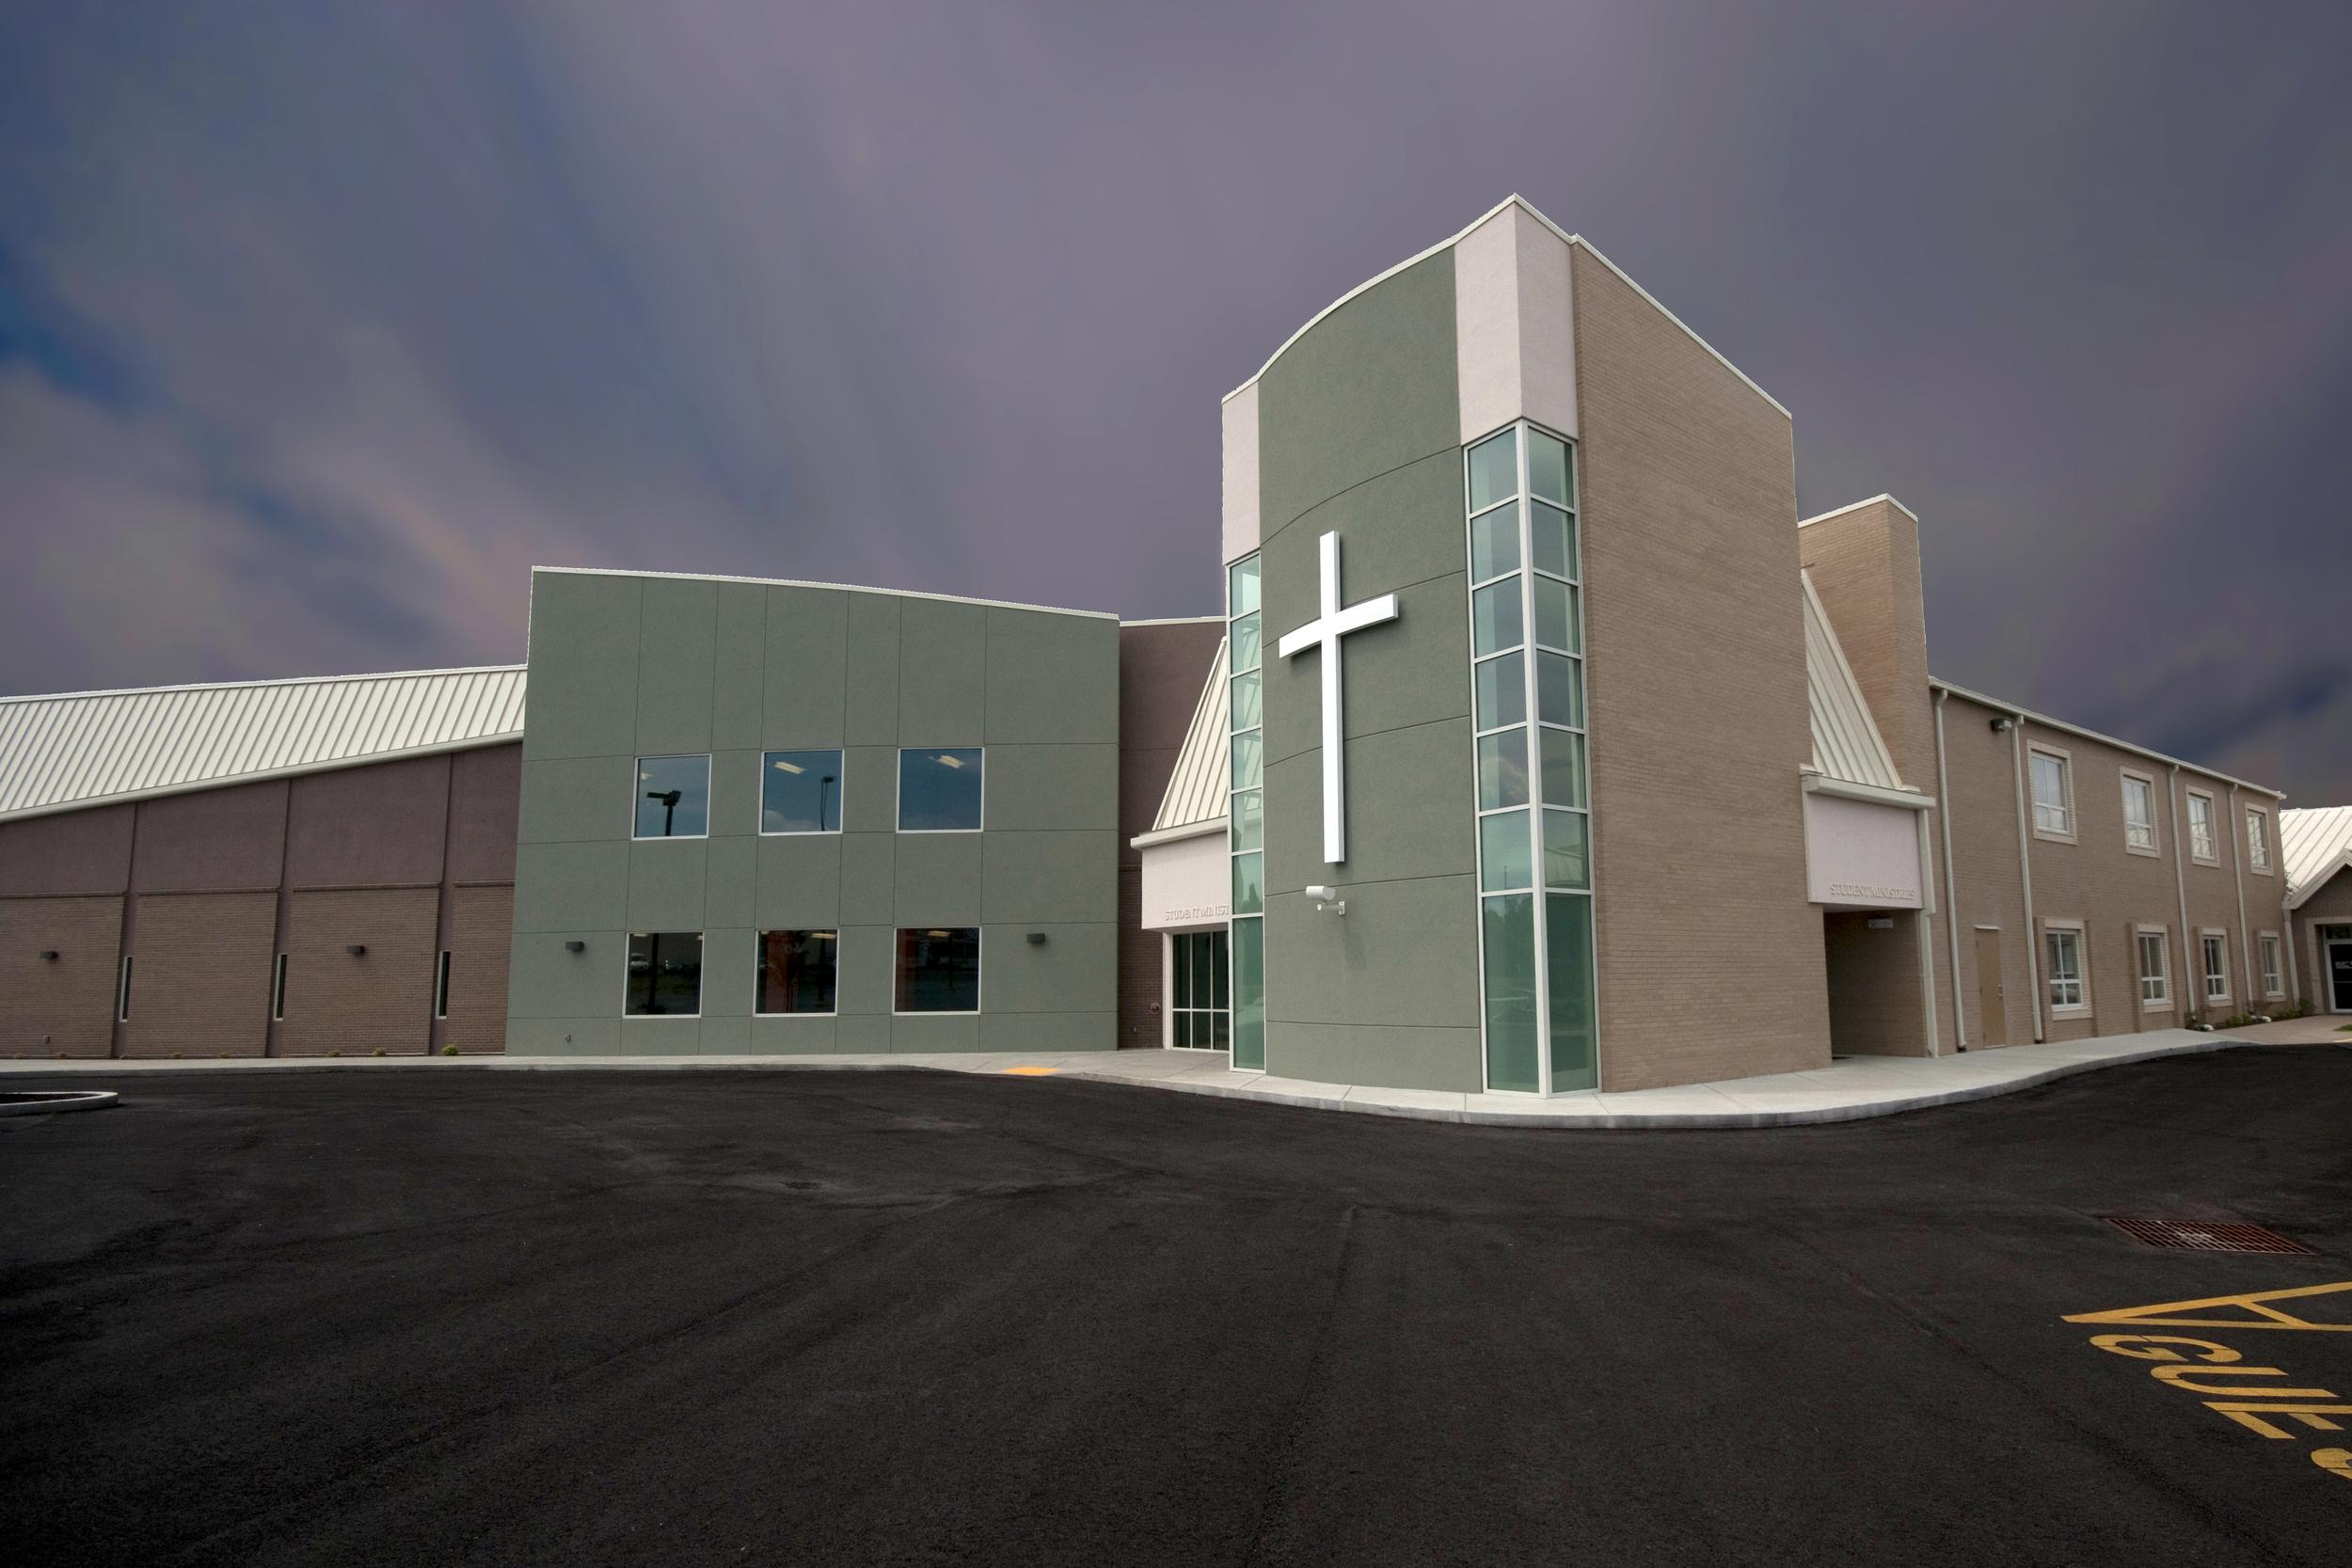 SEMINOLE BAPTIST CHURCH